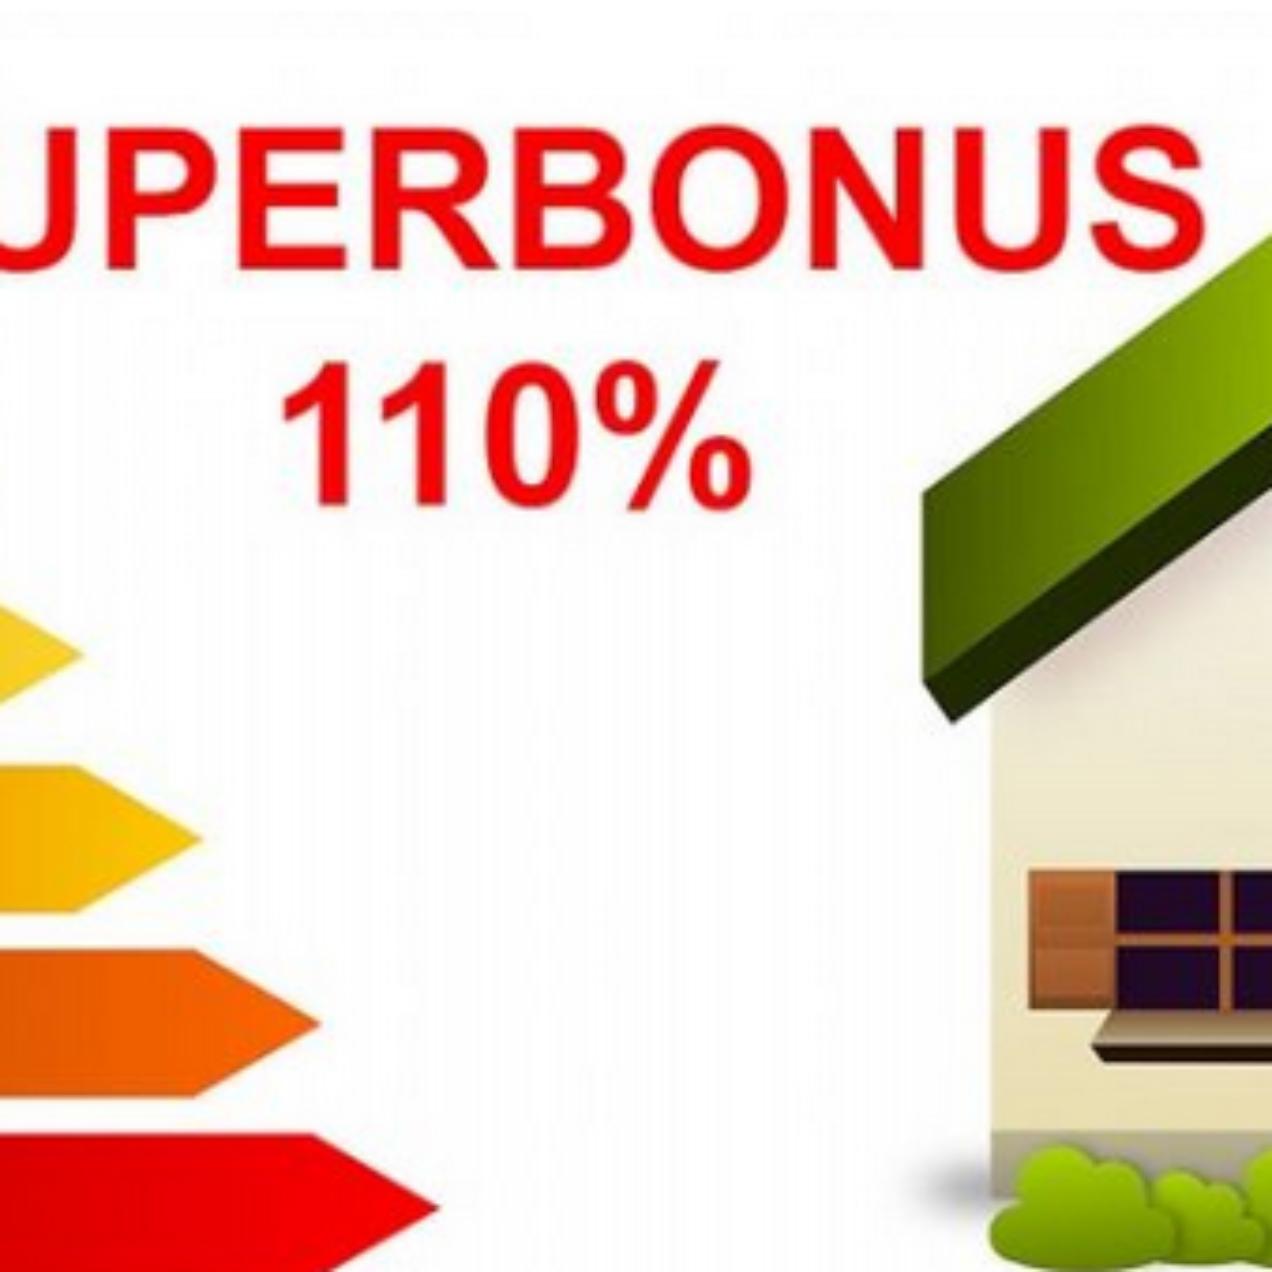 SUPERBONUS 110%: le ultime novità (luglio 2020)